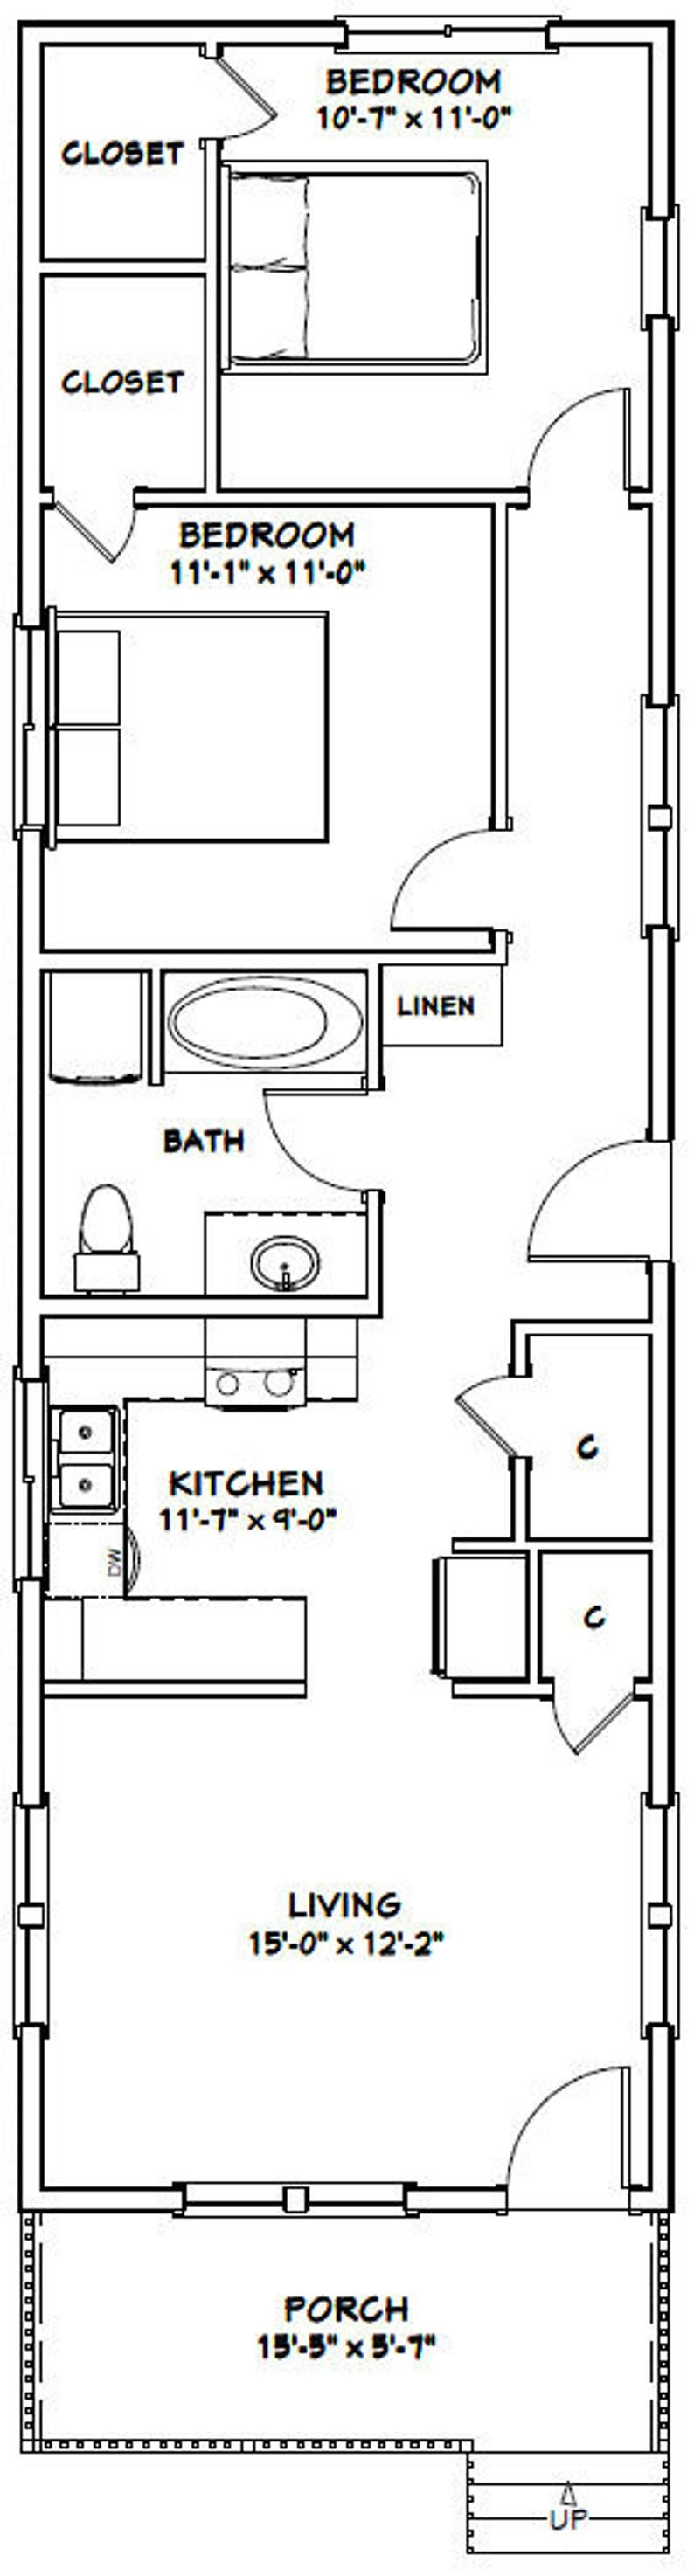 864 sq ft Model 1 2 Bedroom 1 Bath PDF Floor Plan 16x54 House